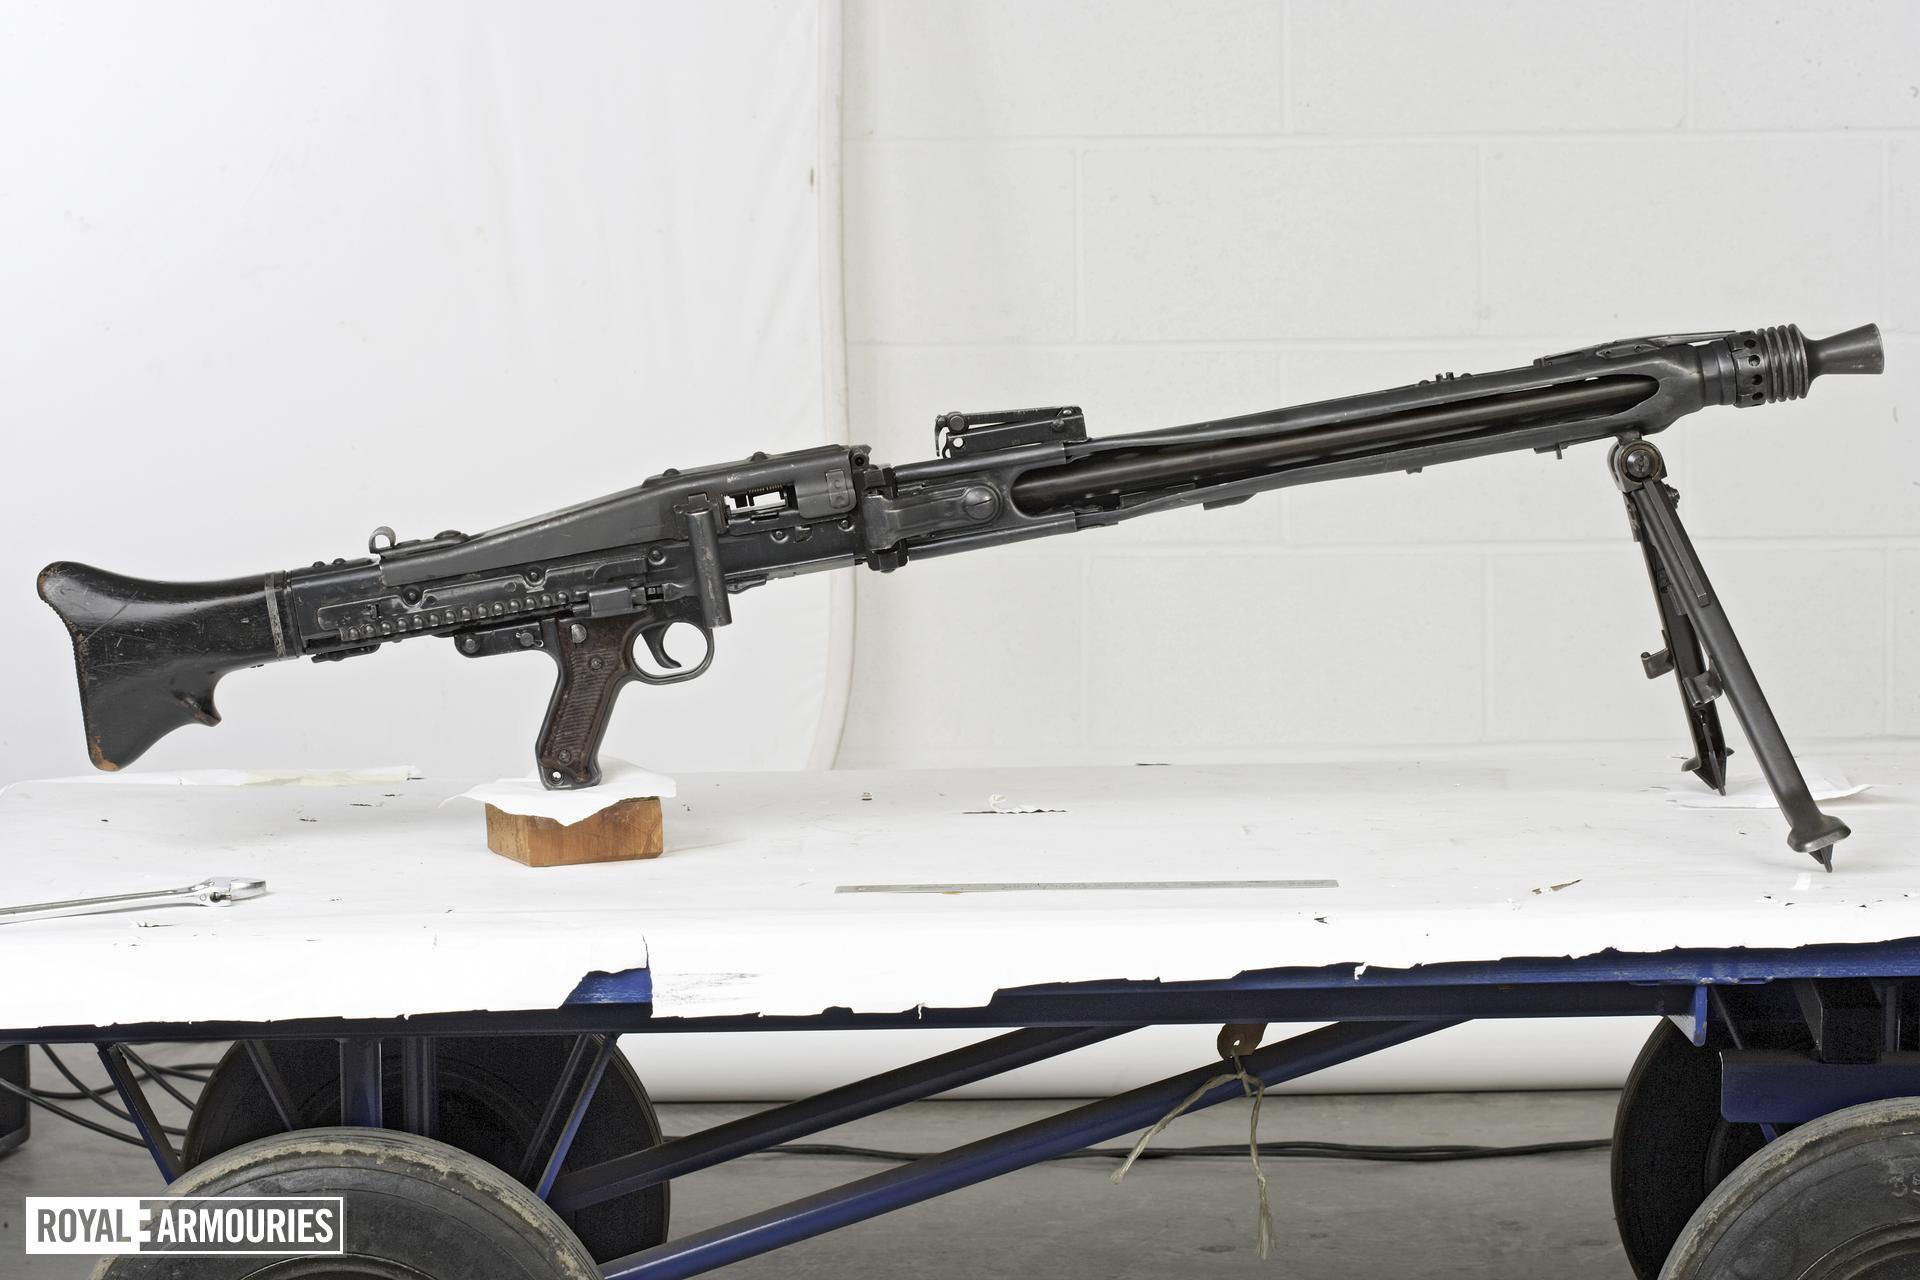 Centrefire automatic machine gun - MG42